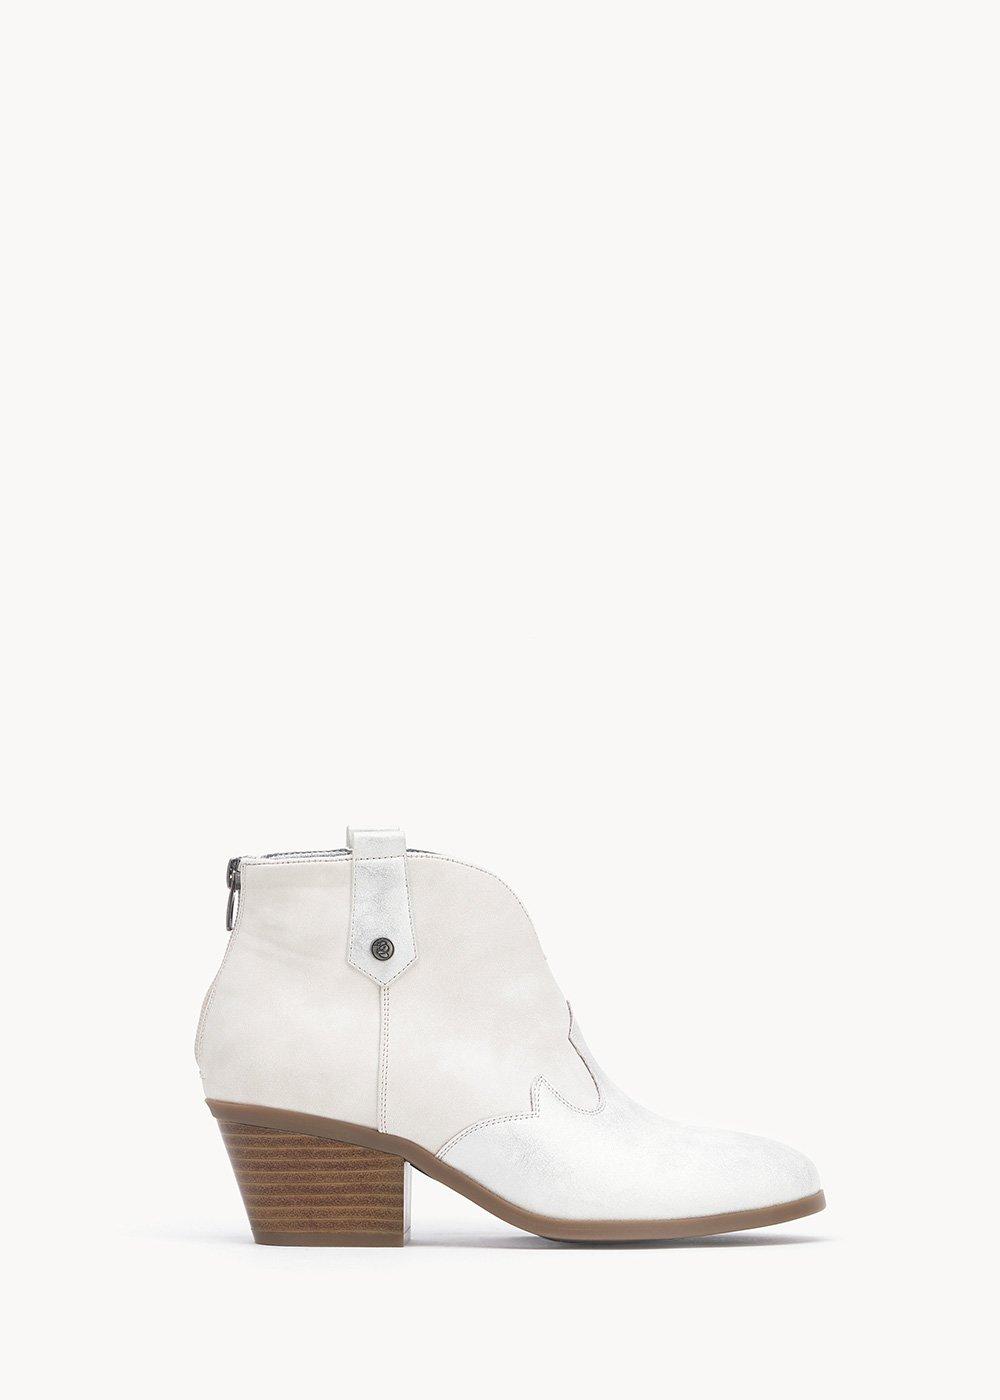 Sunny cowboy boots